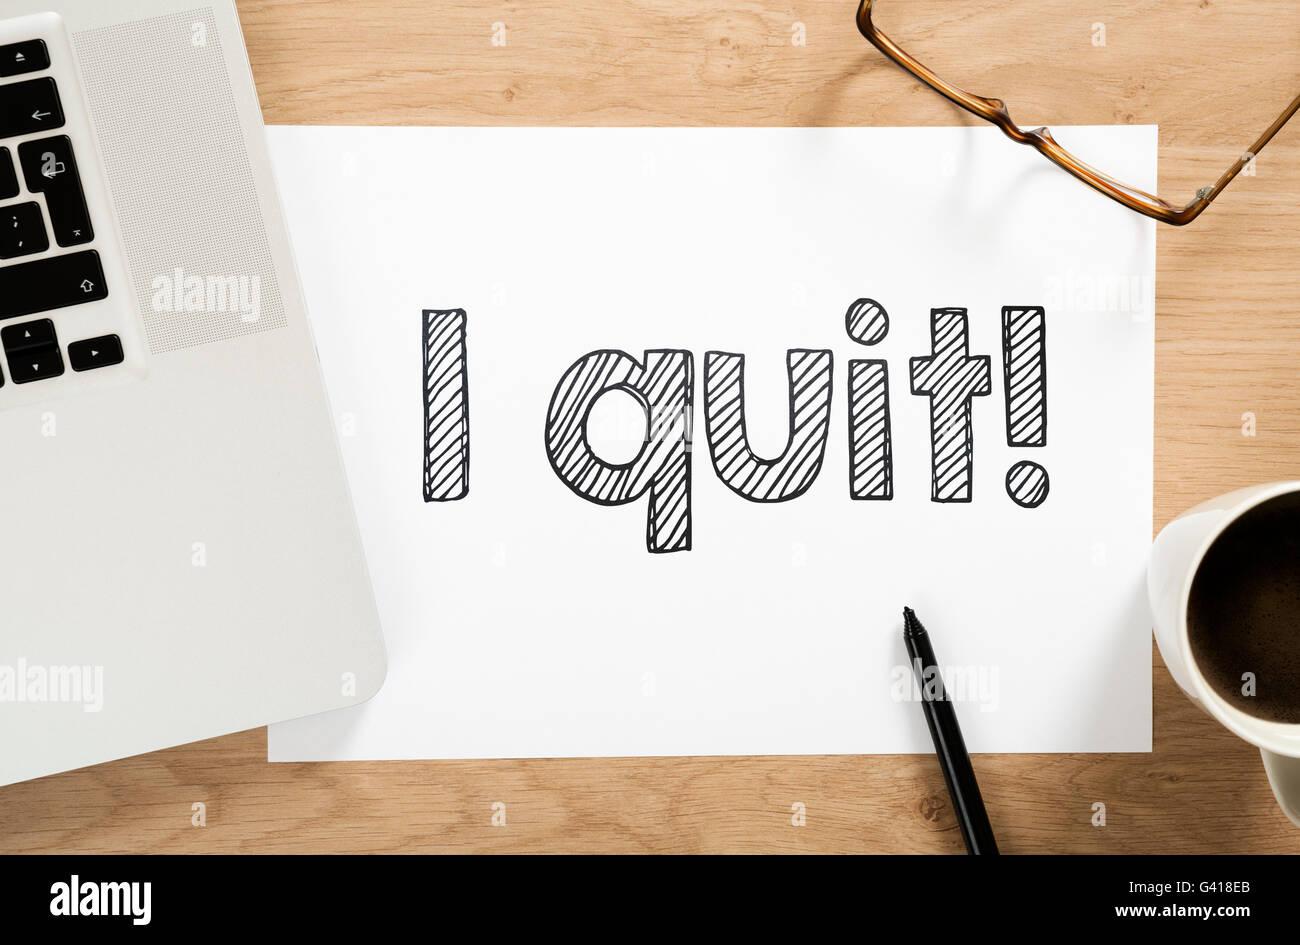 'I quit!' written paper on the office desk - Stock Image